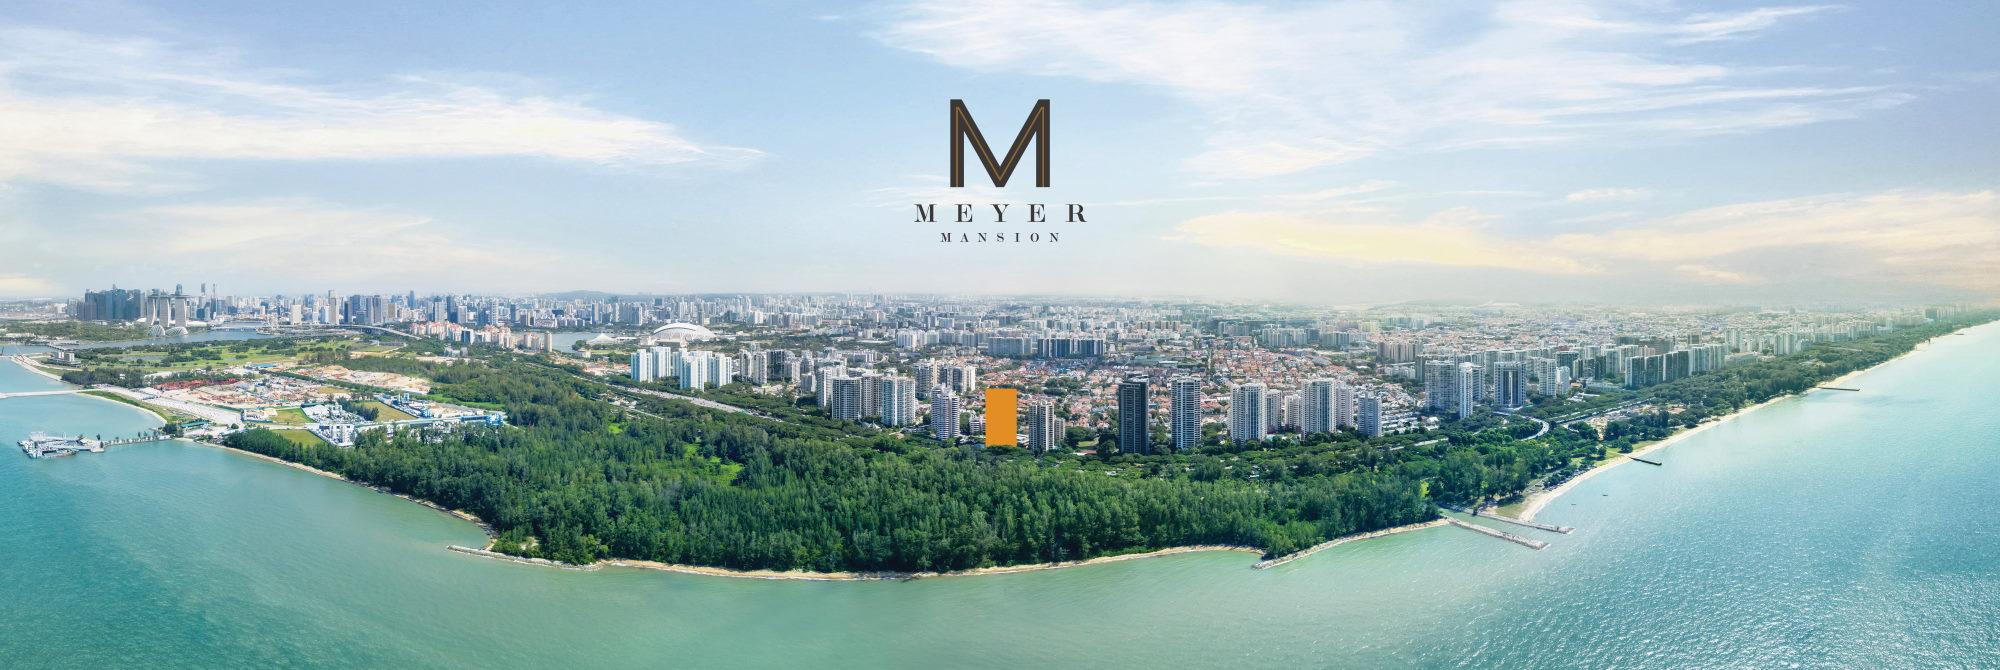 Meyer Mansion (美雅豪苑) image